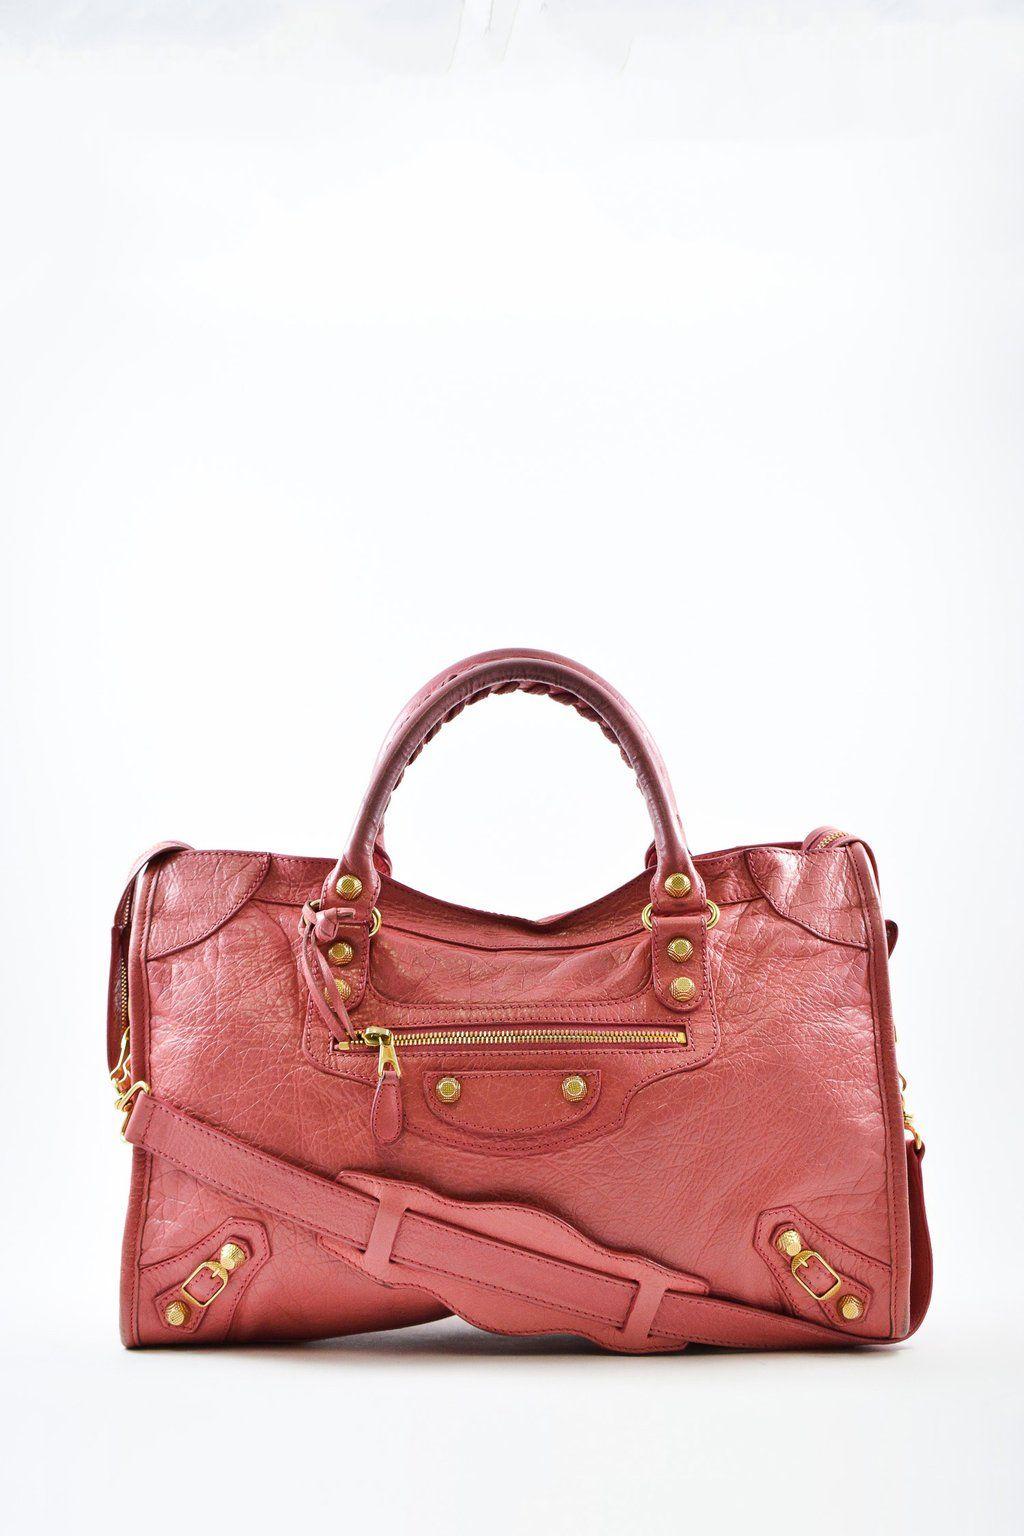 0db030e79f7 Balenciaga Pink City Crossbody Bag | SHOP OUR BAGS | Bags ...